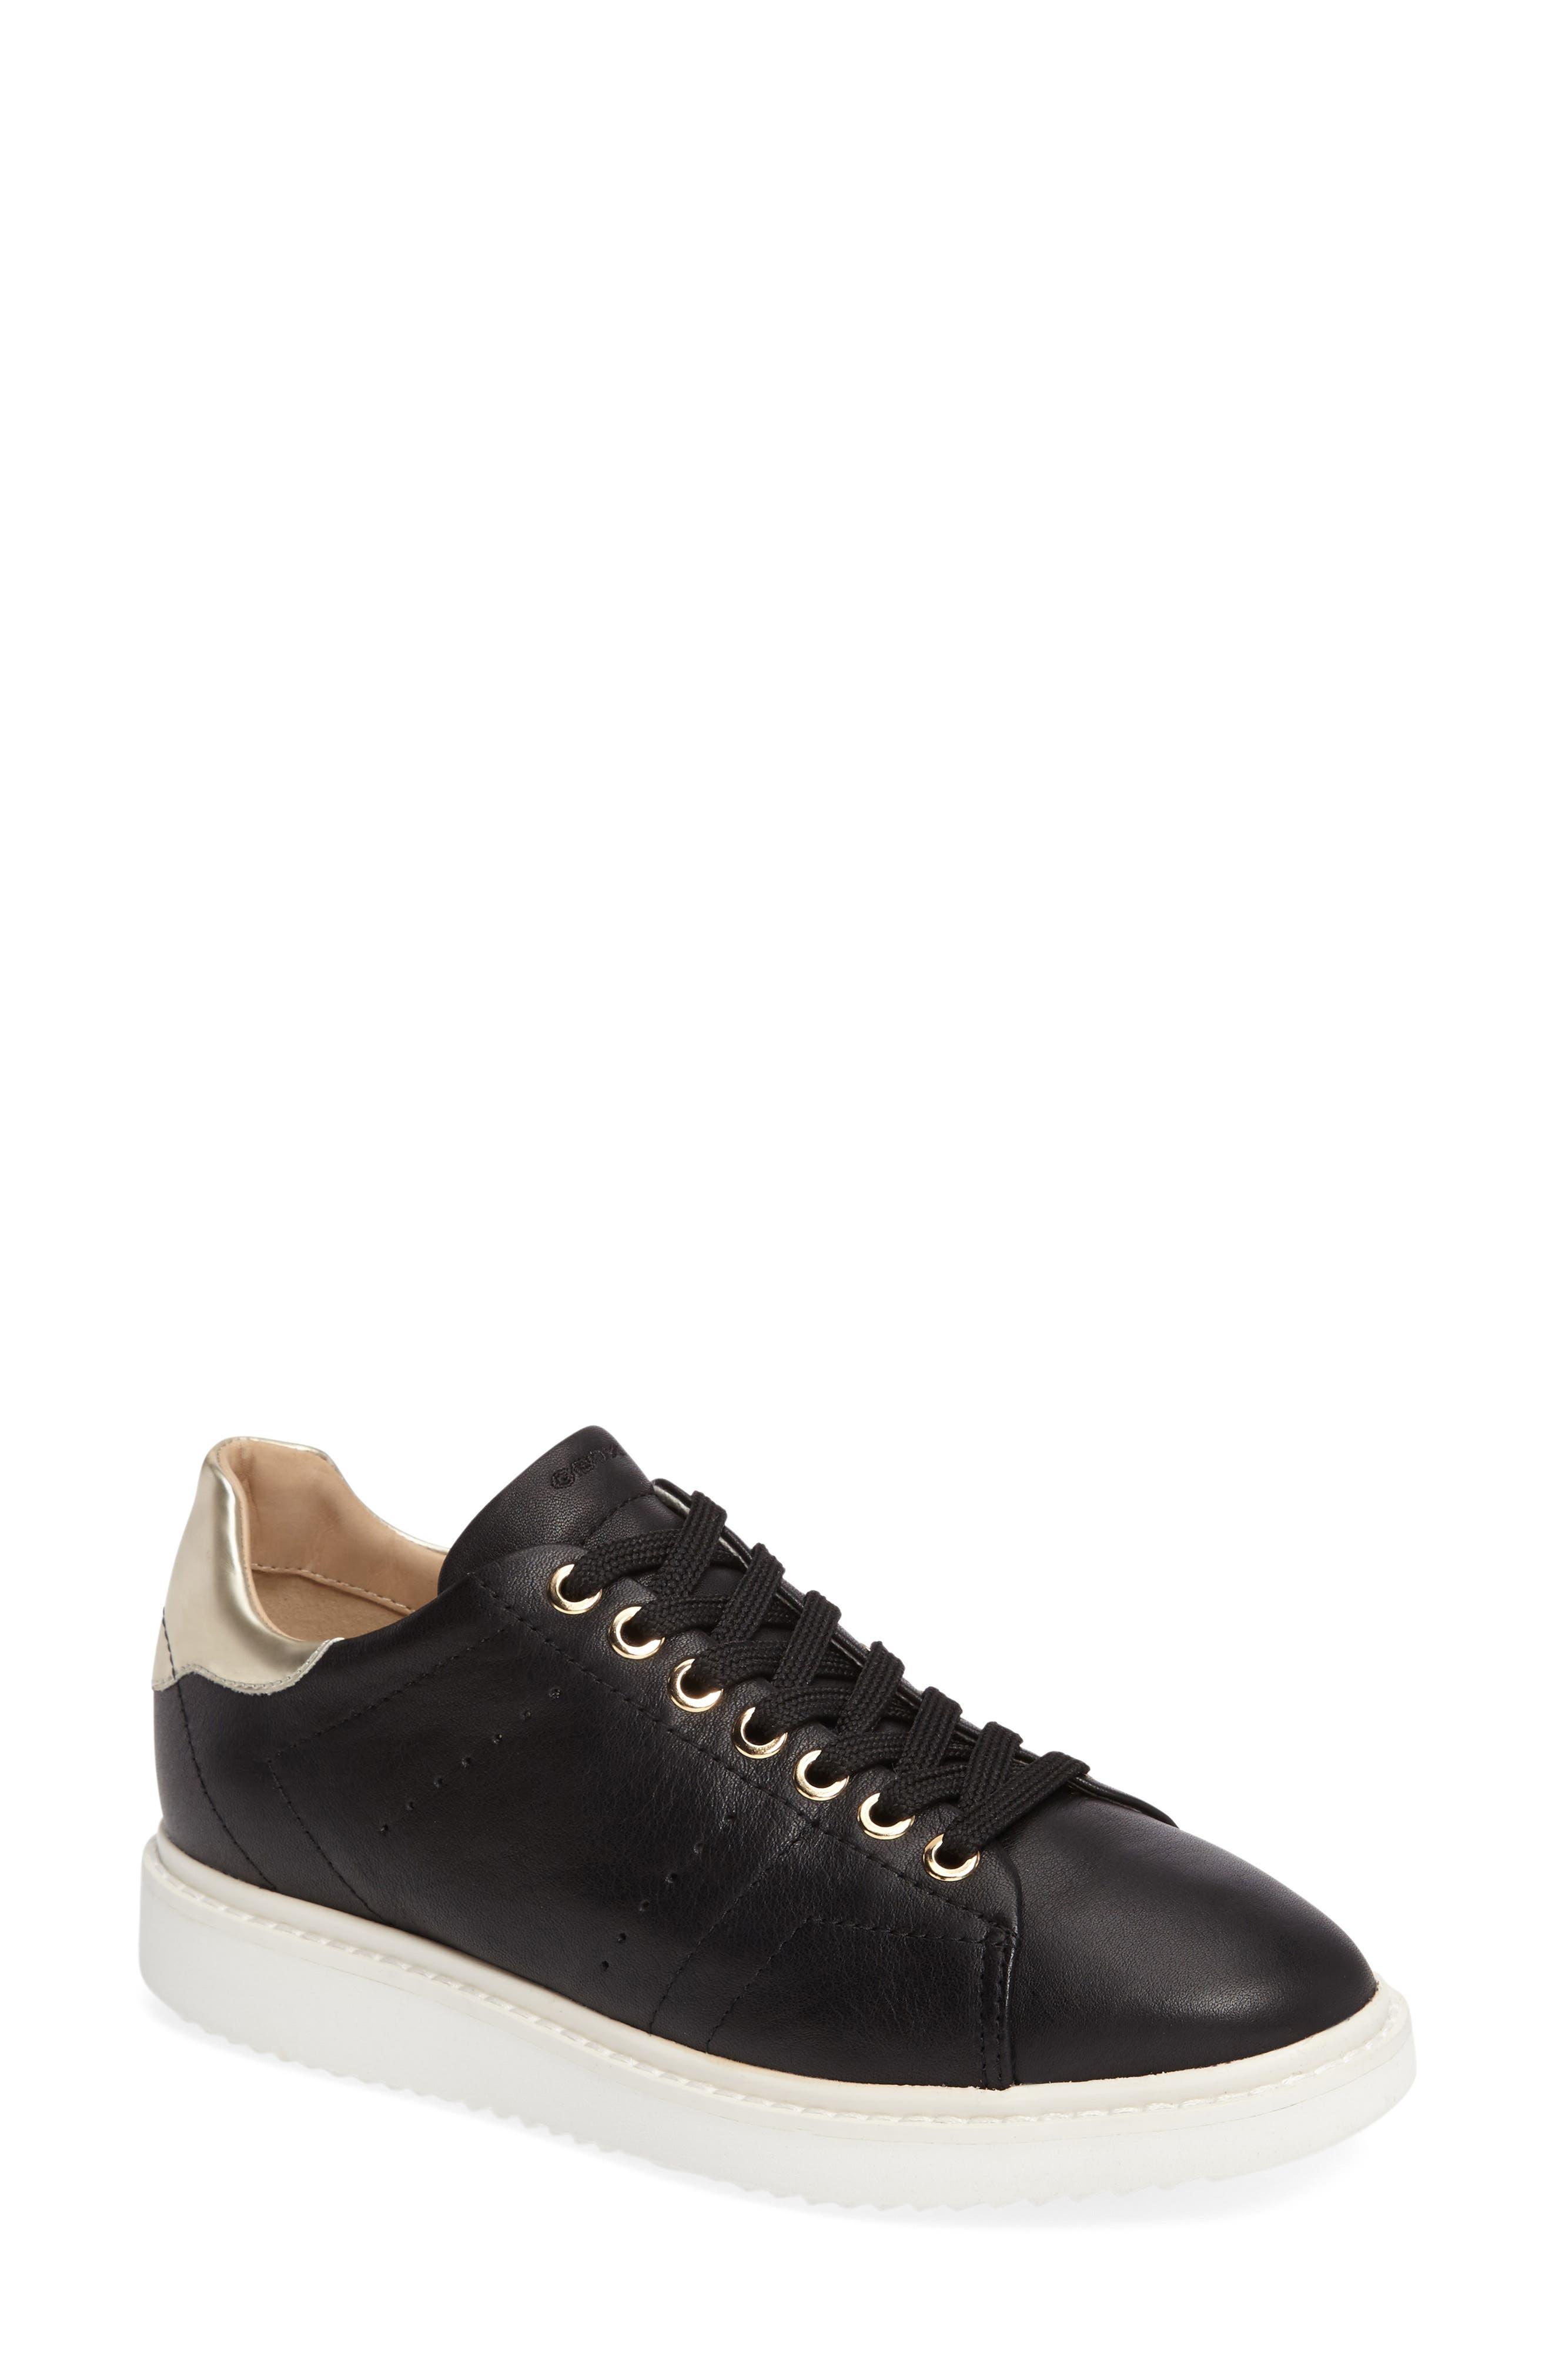 Thymar Sneaker,                         Main,                         color, Black Leather